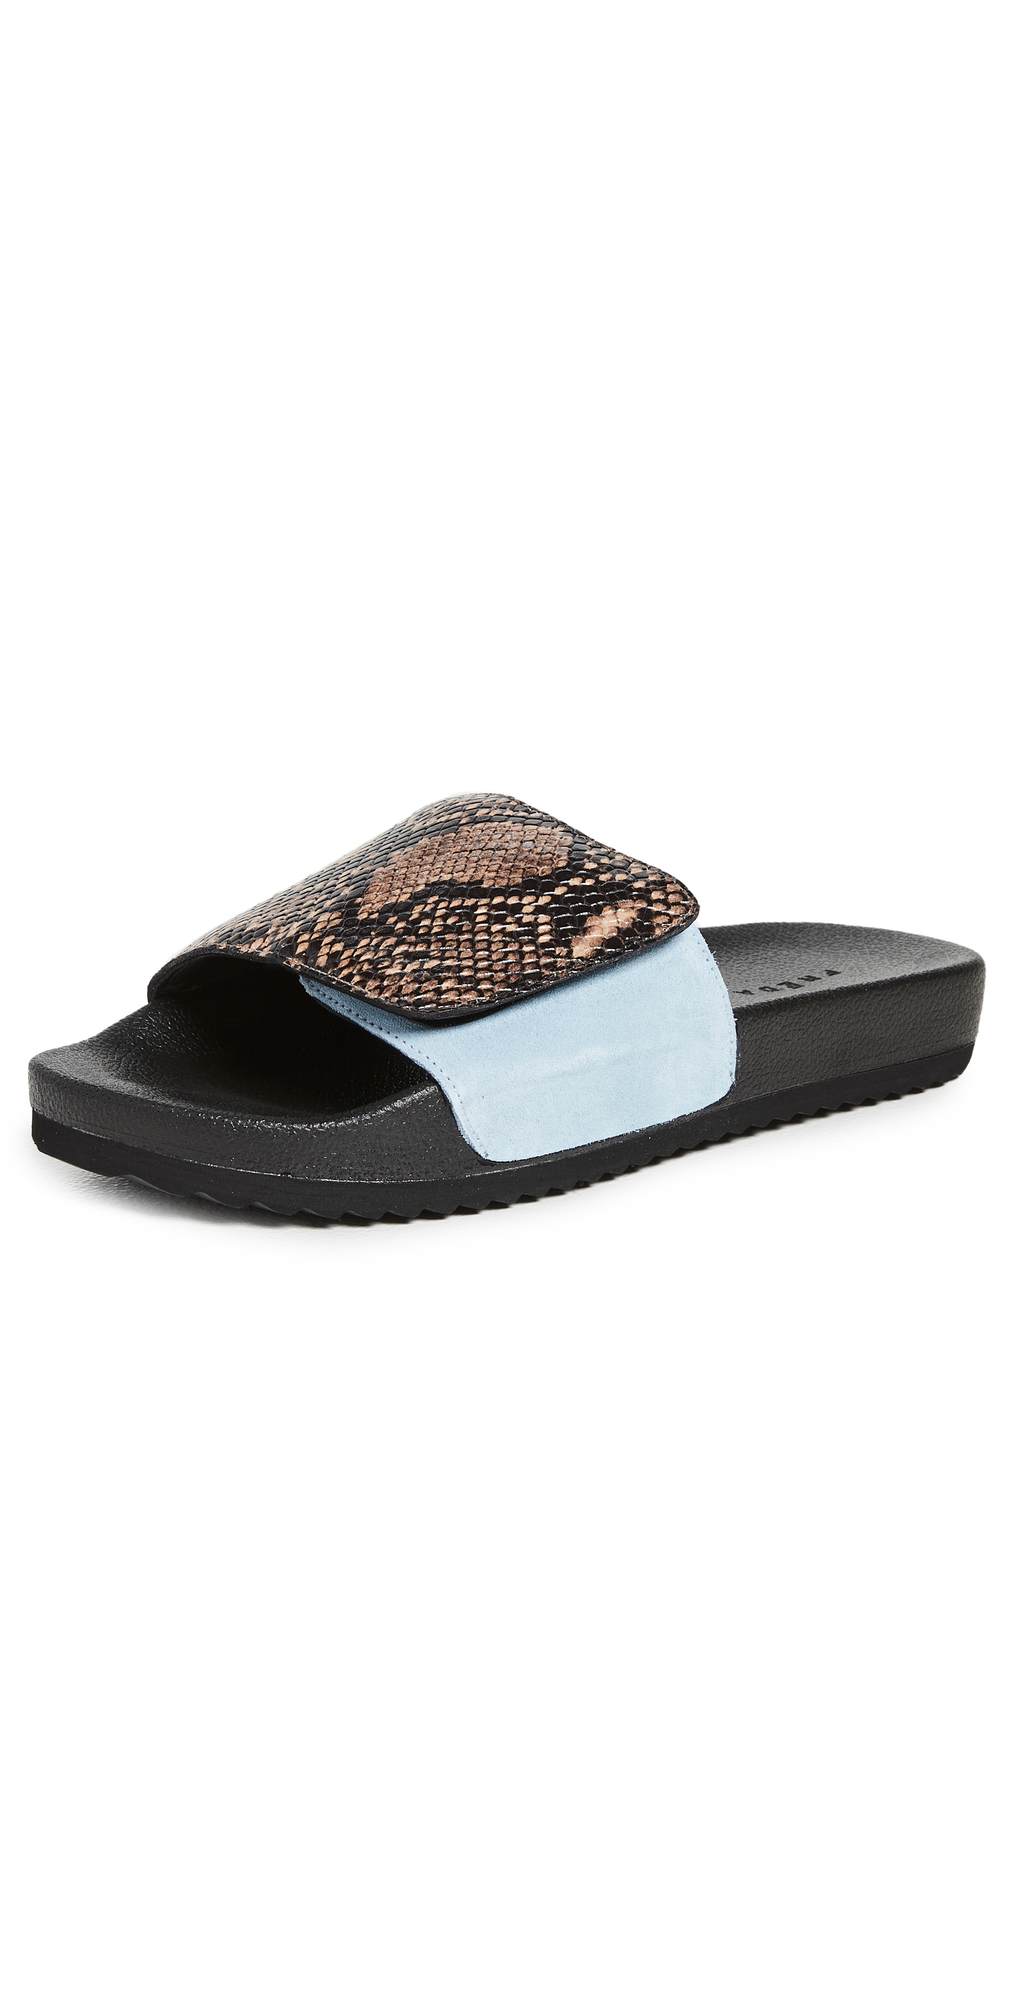 Ona Sandals